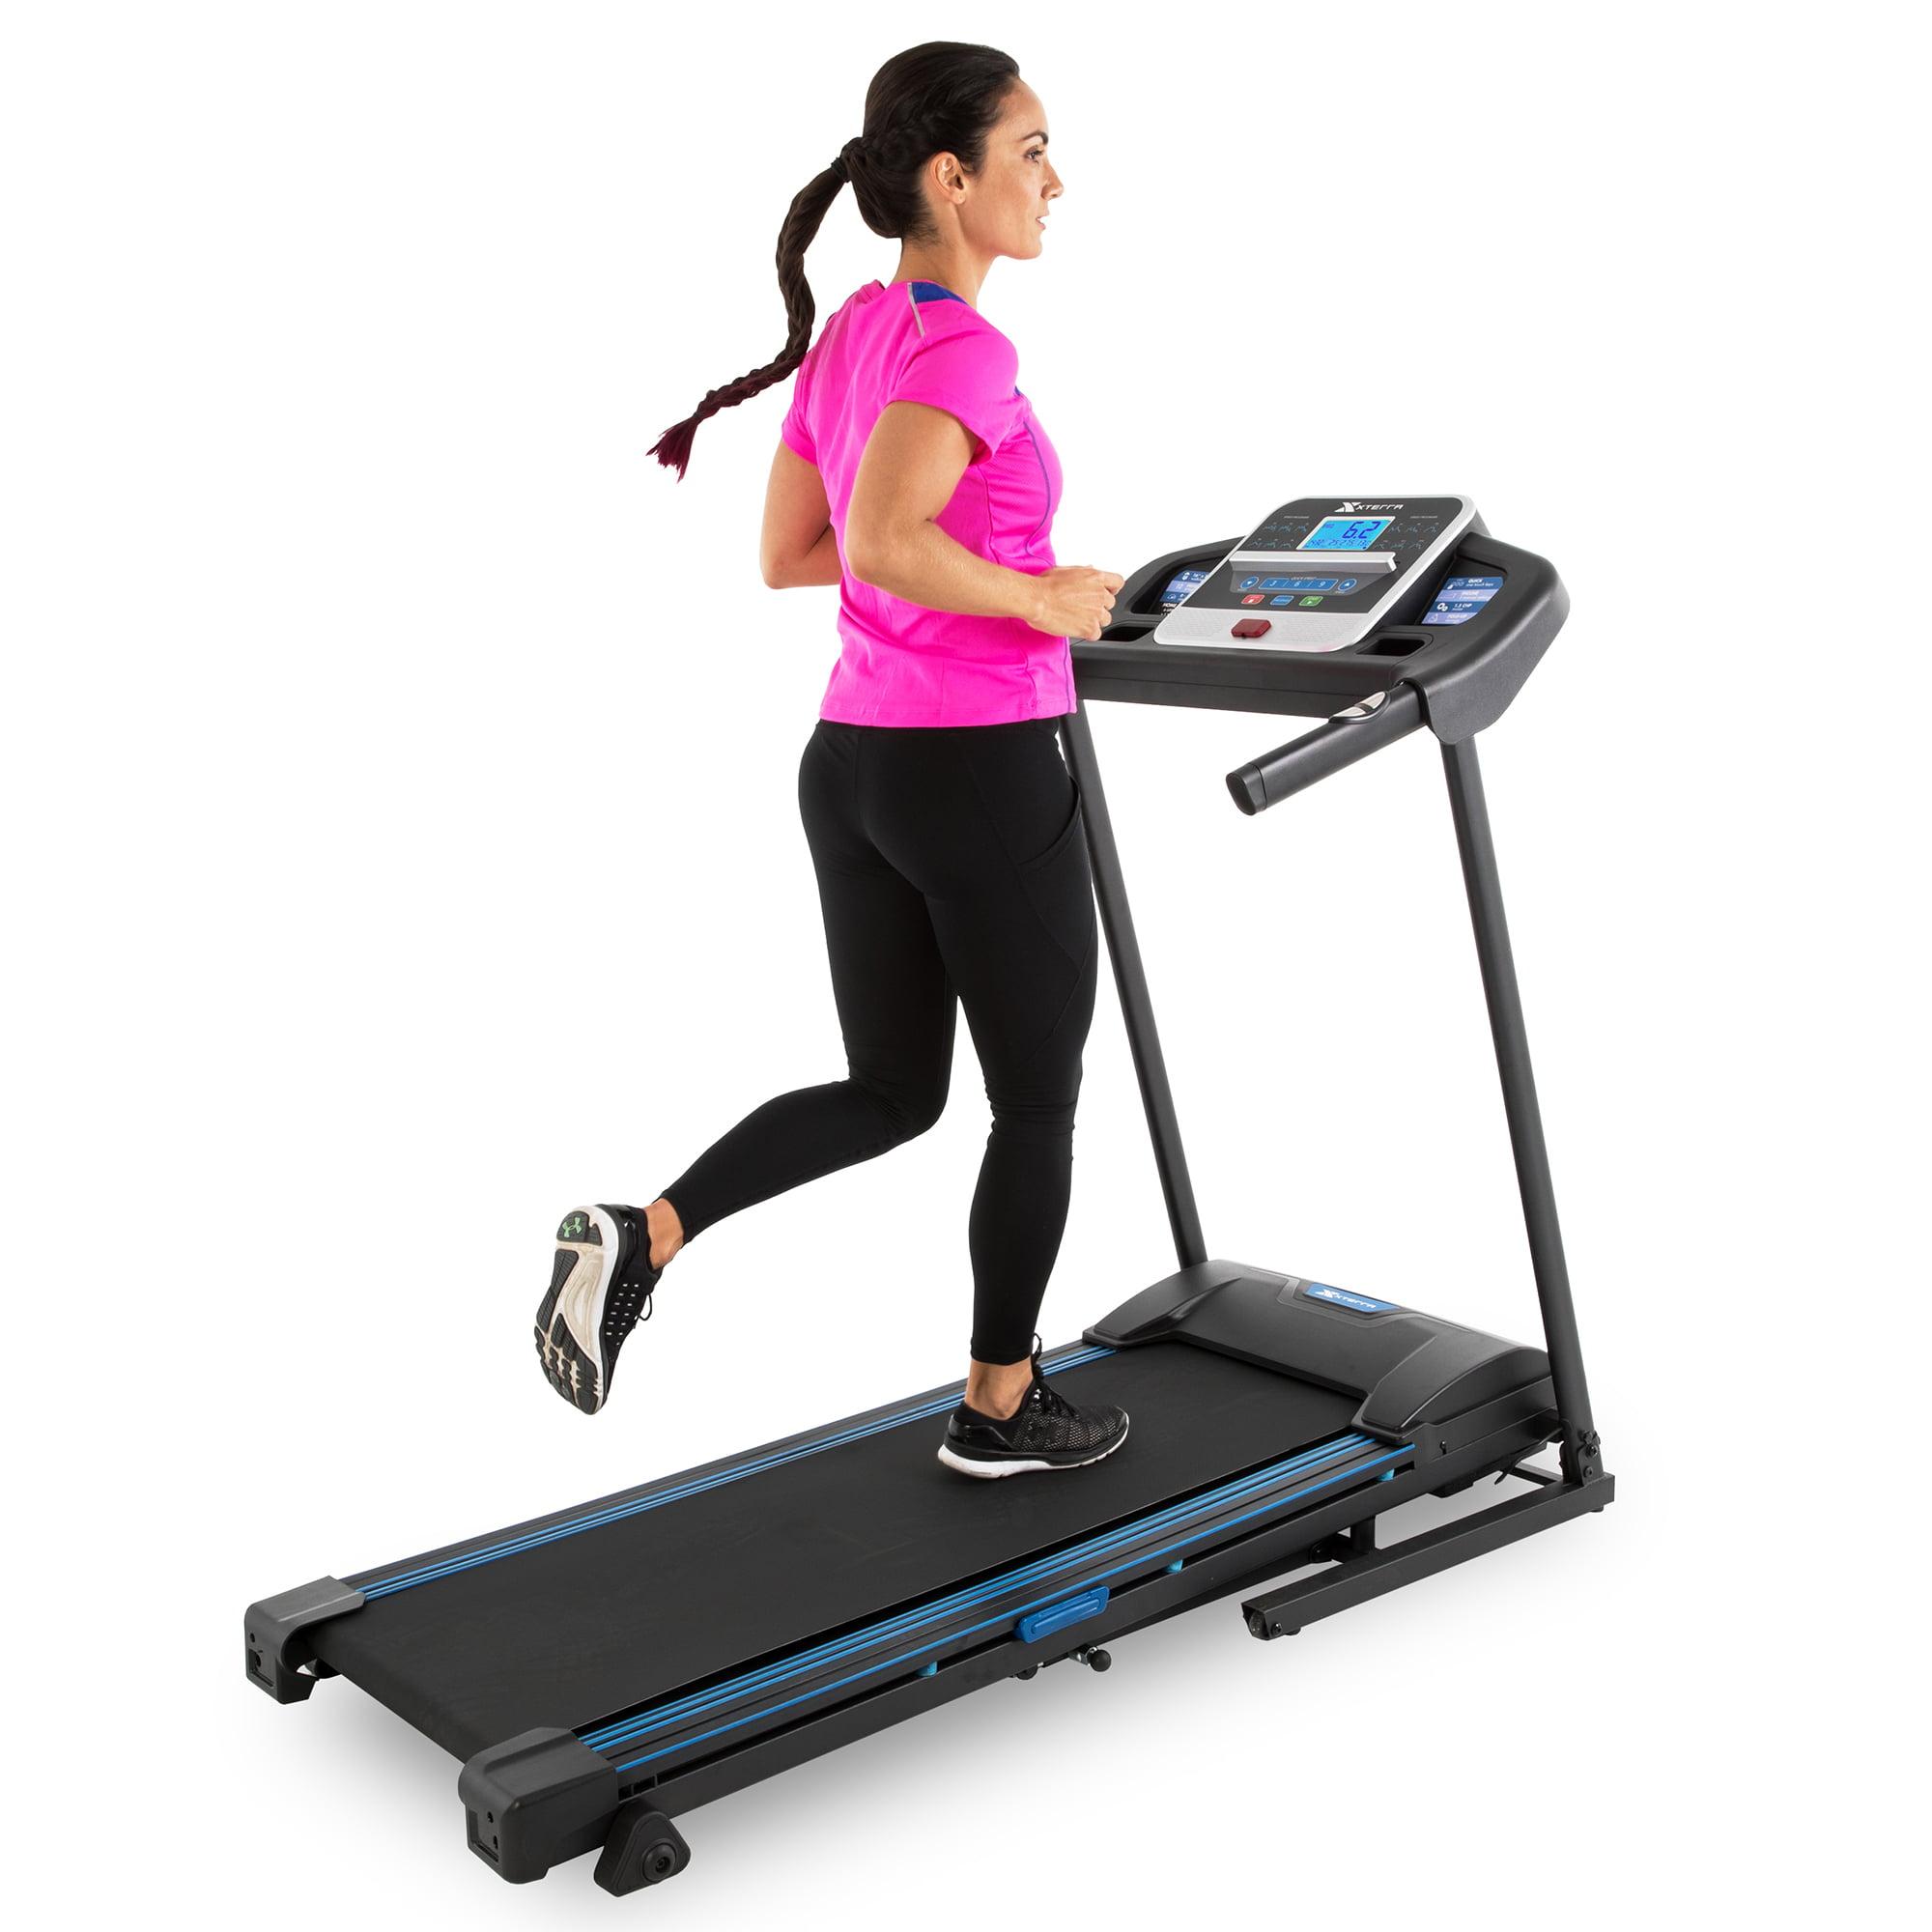 XTERRA Fitness TR200 Folding Treadmill with XTRASoft Cushioned Deck by Dyaco International